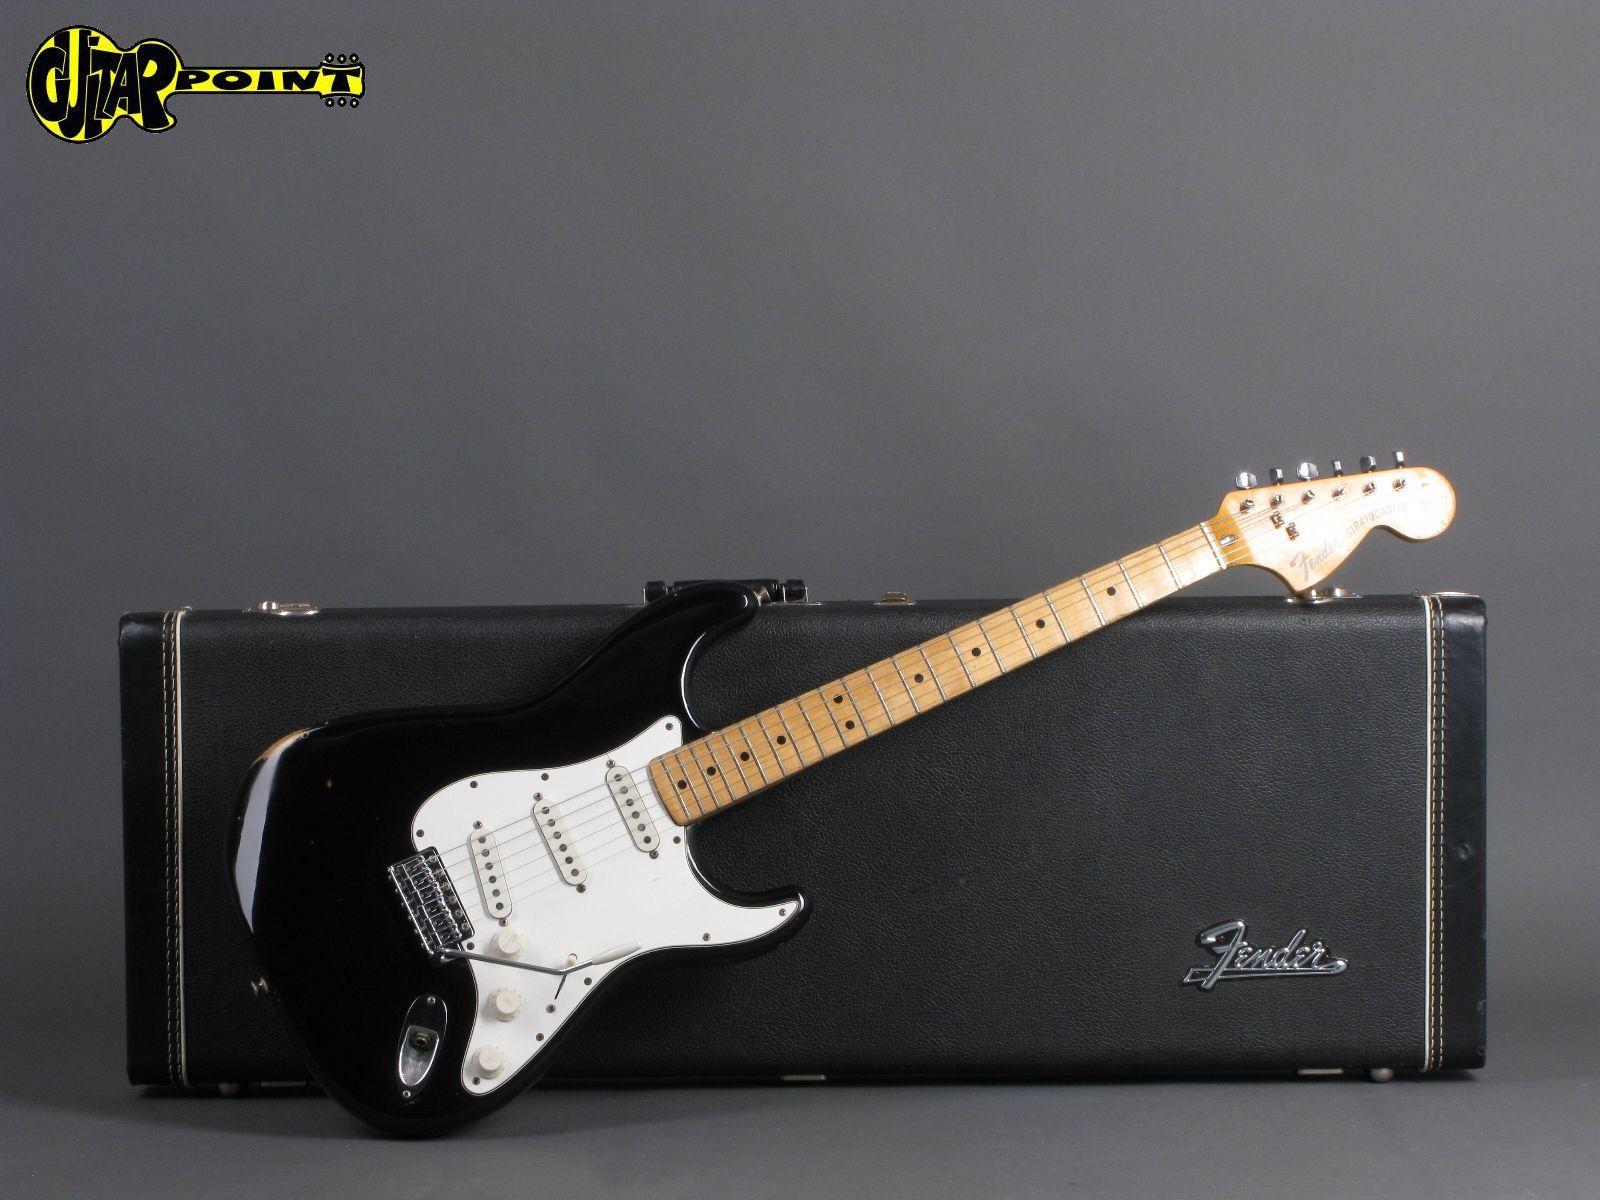 https://guitarpoint.de/app/uploads/products/1974-fender-stratocaster-black/Fender74Blk532148_19.jpg